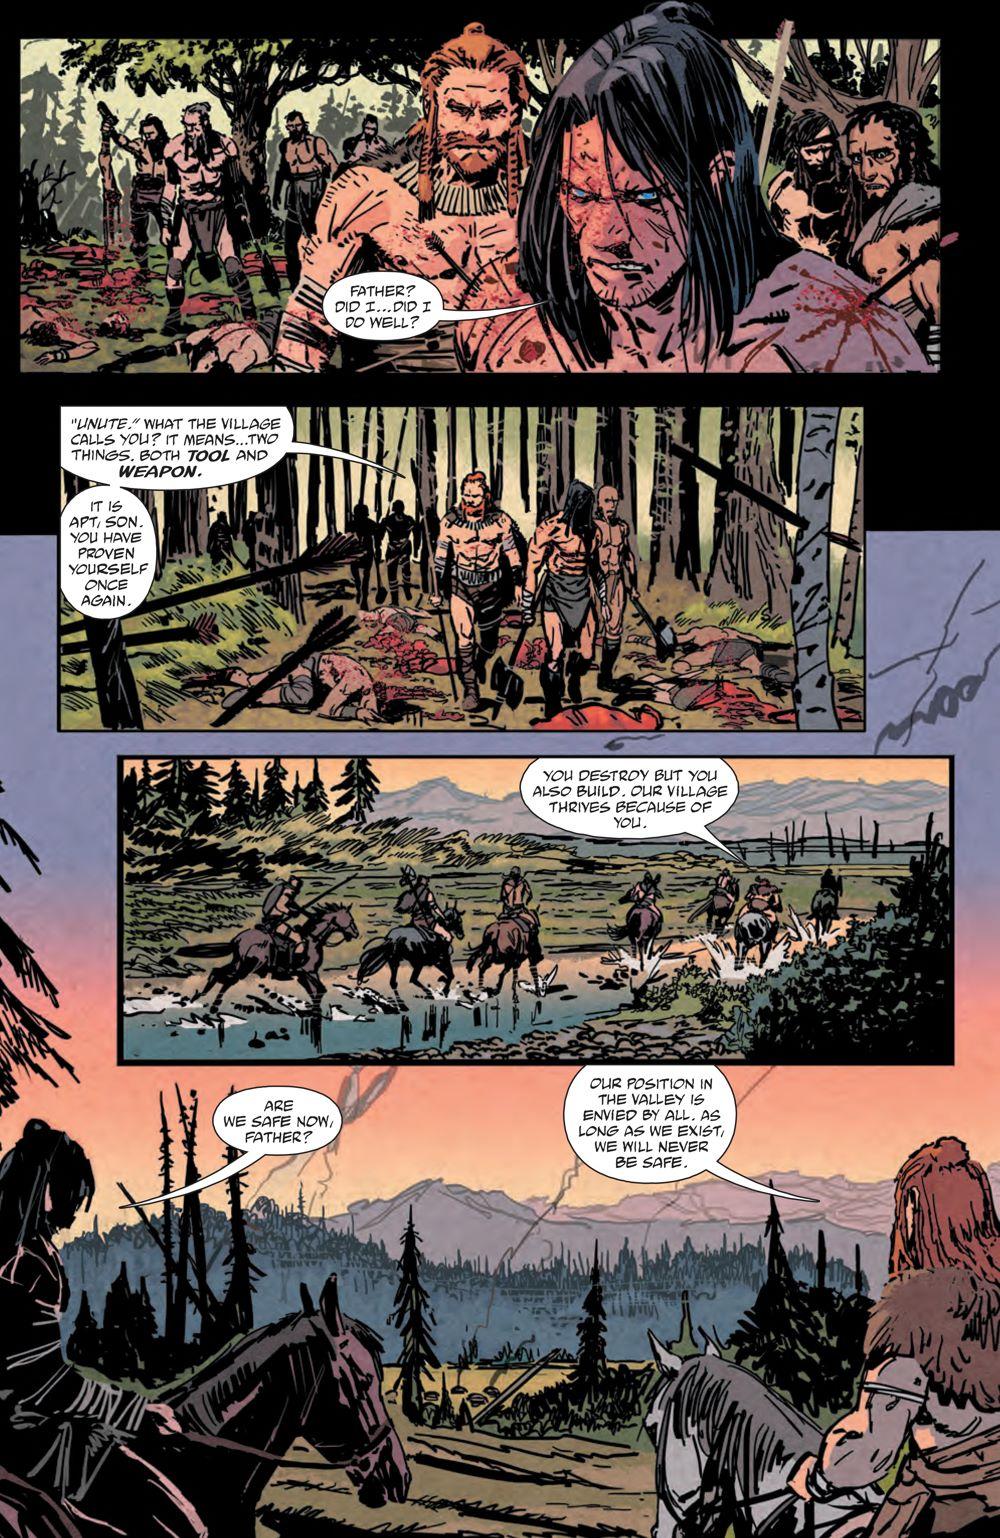 BRZRKR_003_PRESS_5 ComicList Previews: BRZRKR #3 (OF 12)